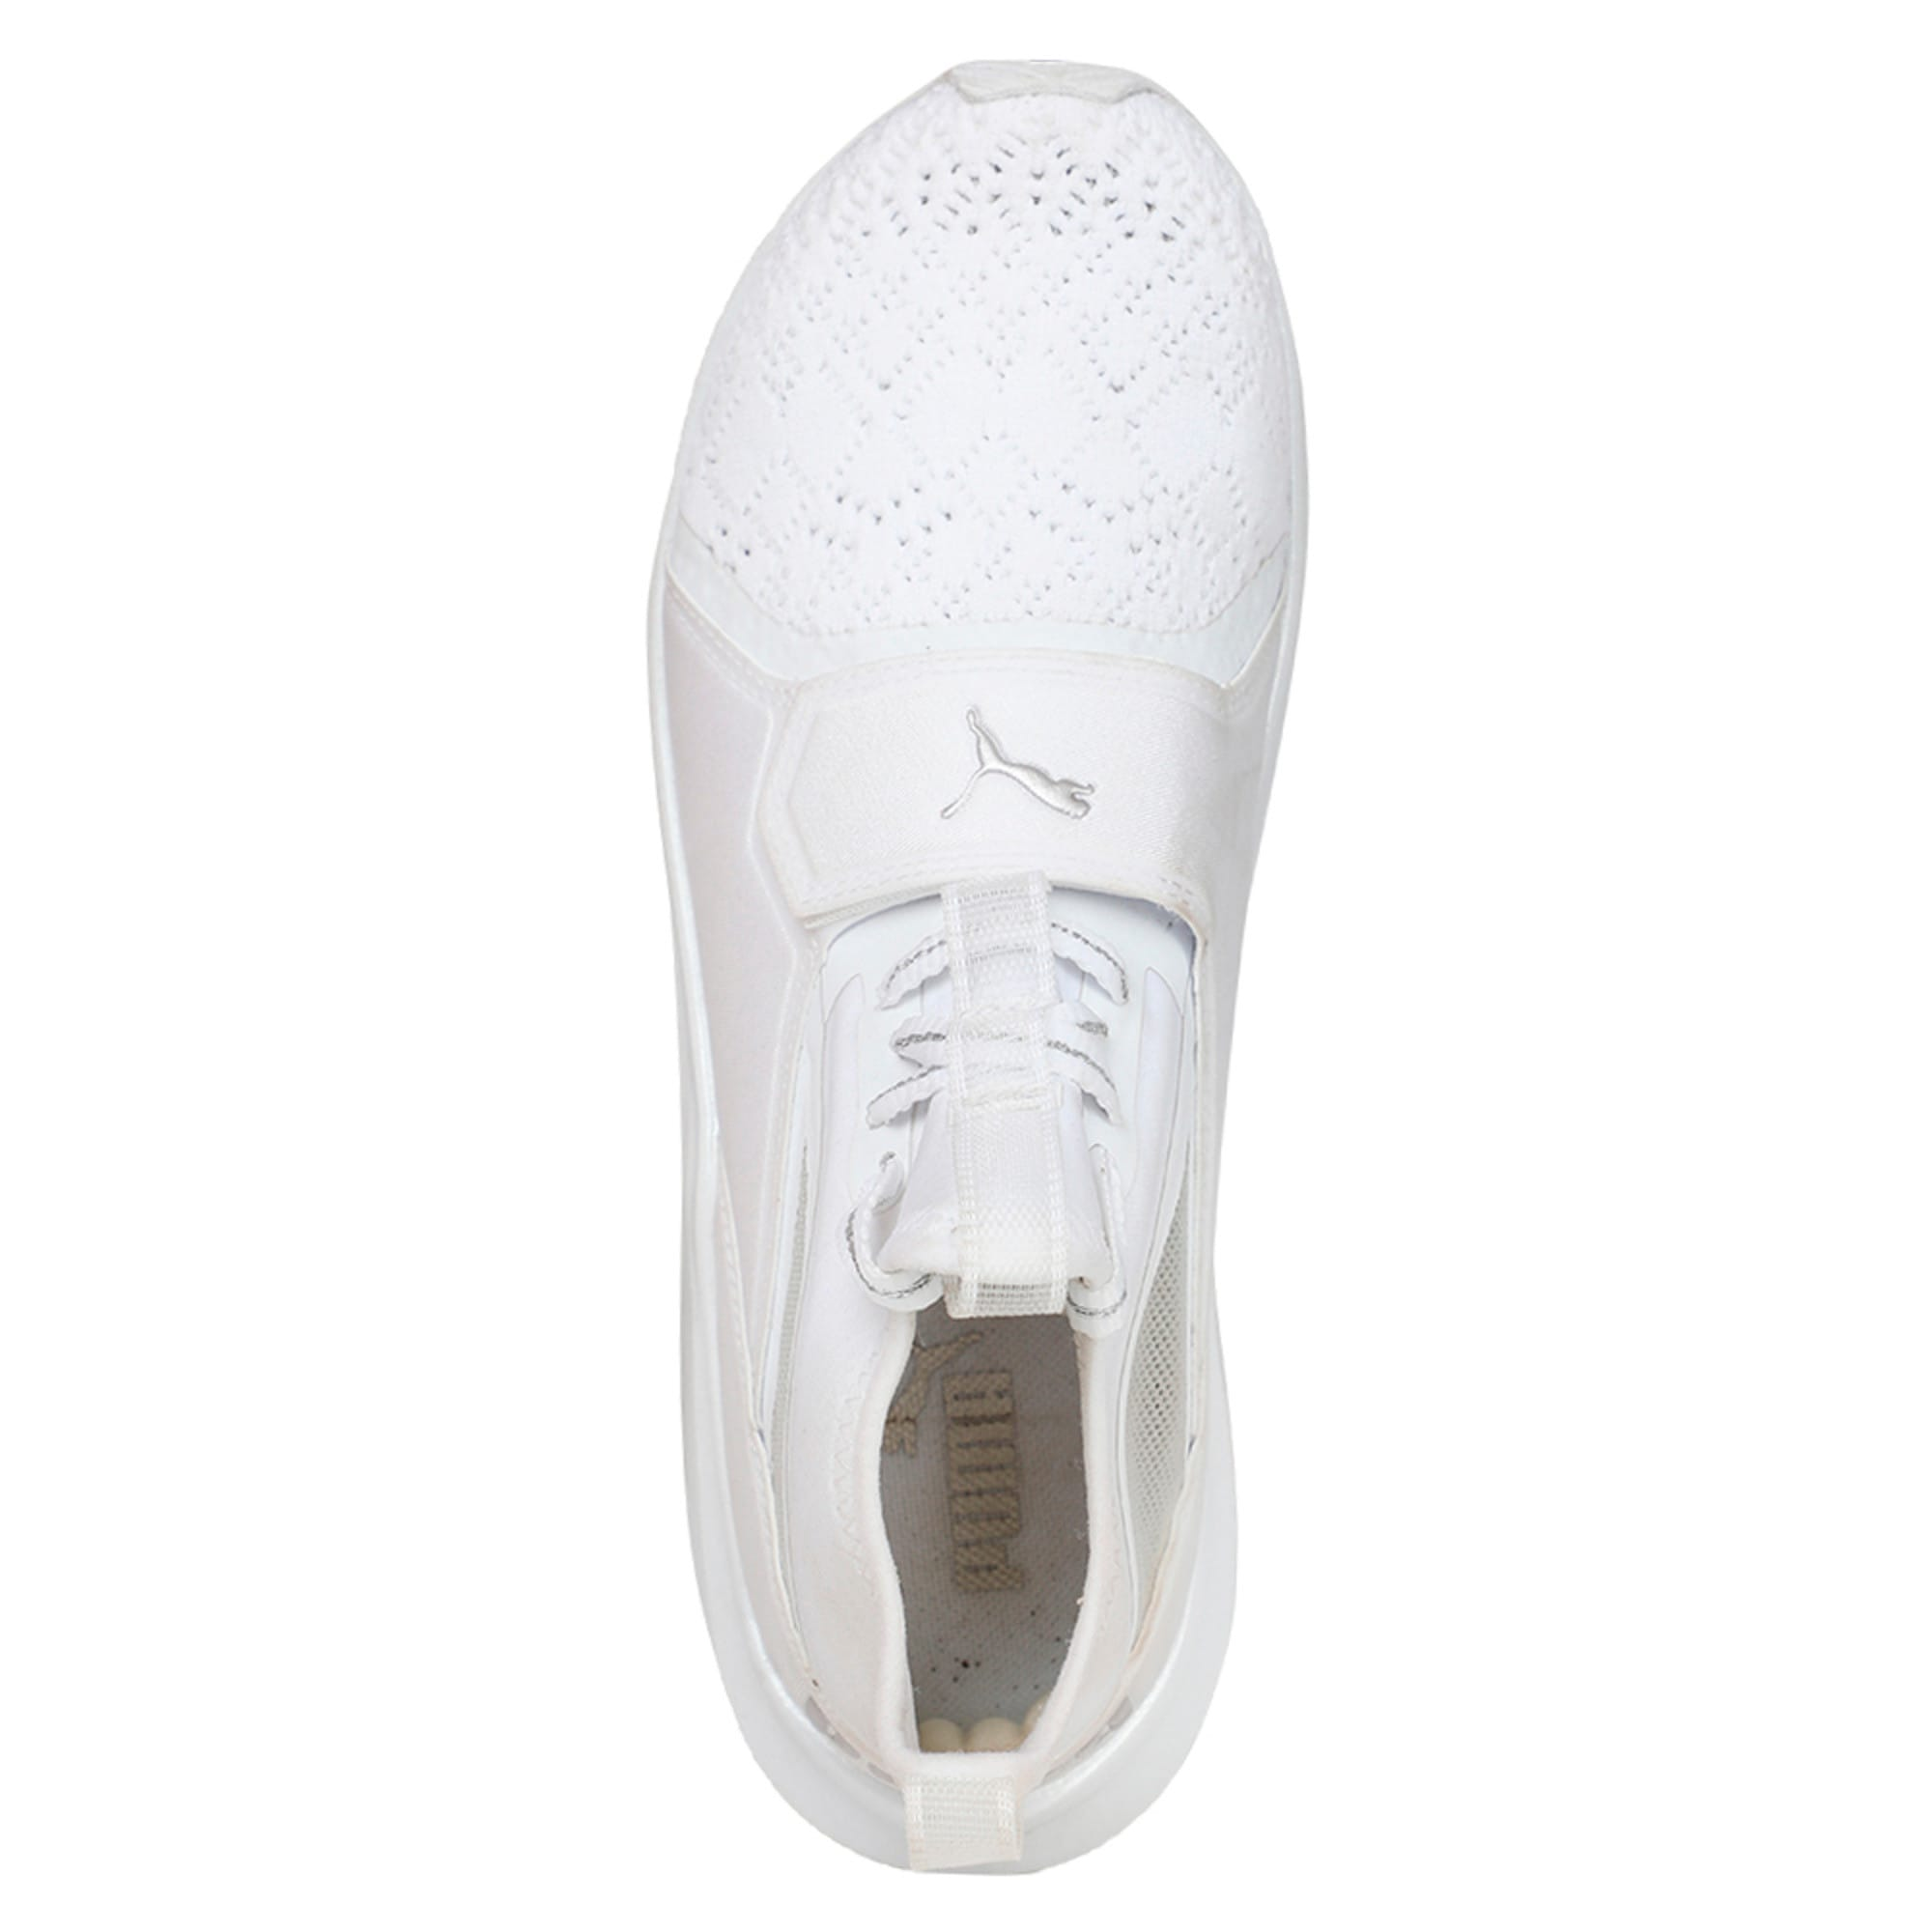 Thumbnail 3 of Phenom En Pointe Women's Training Shoes, Puma White-Metallic Beige, medium-IND